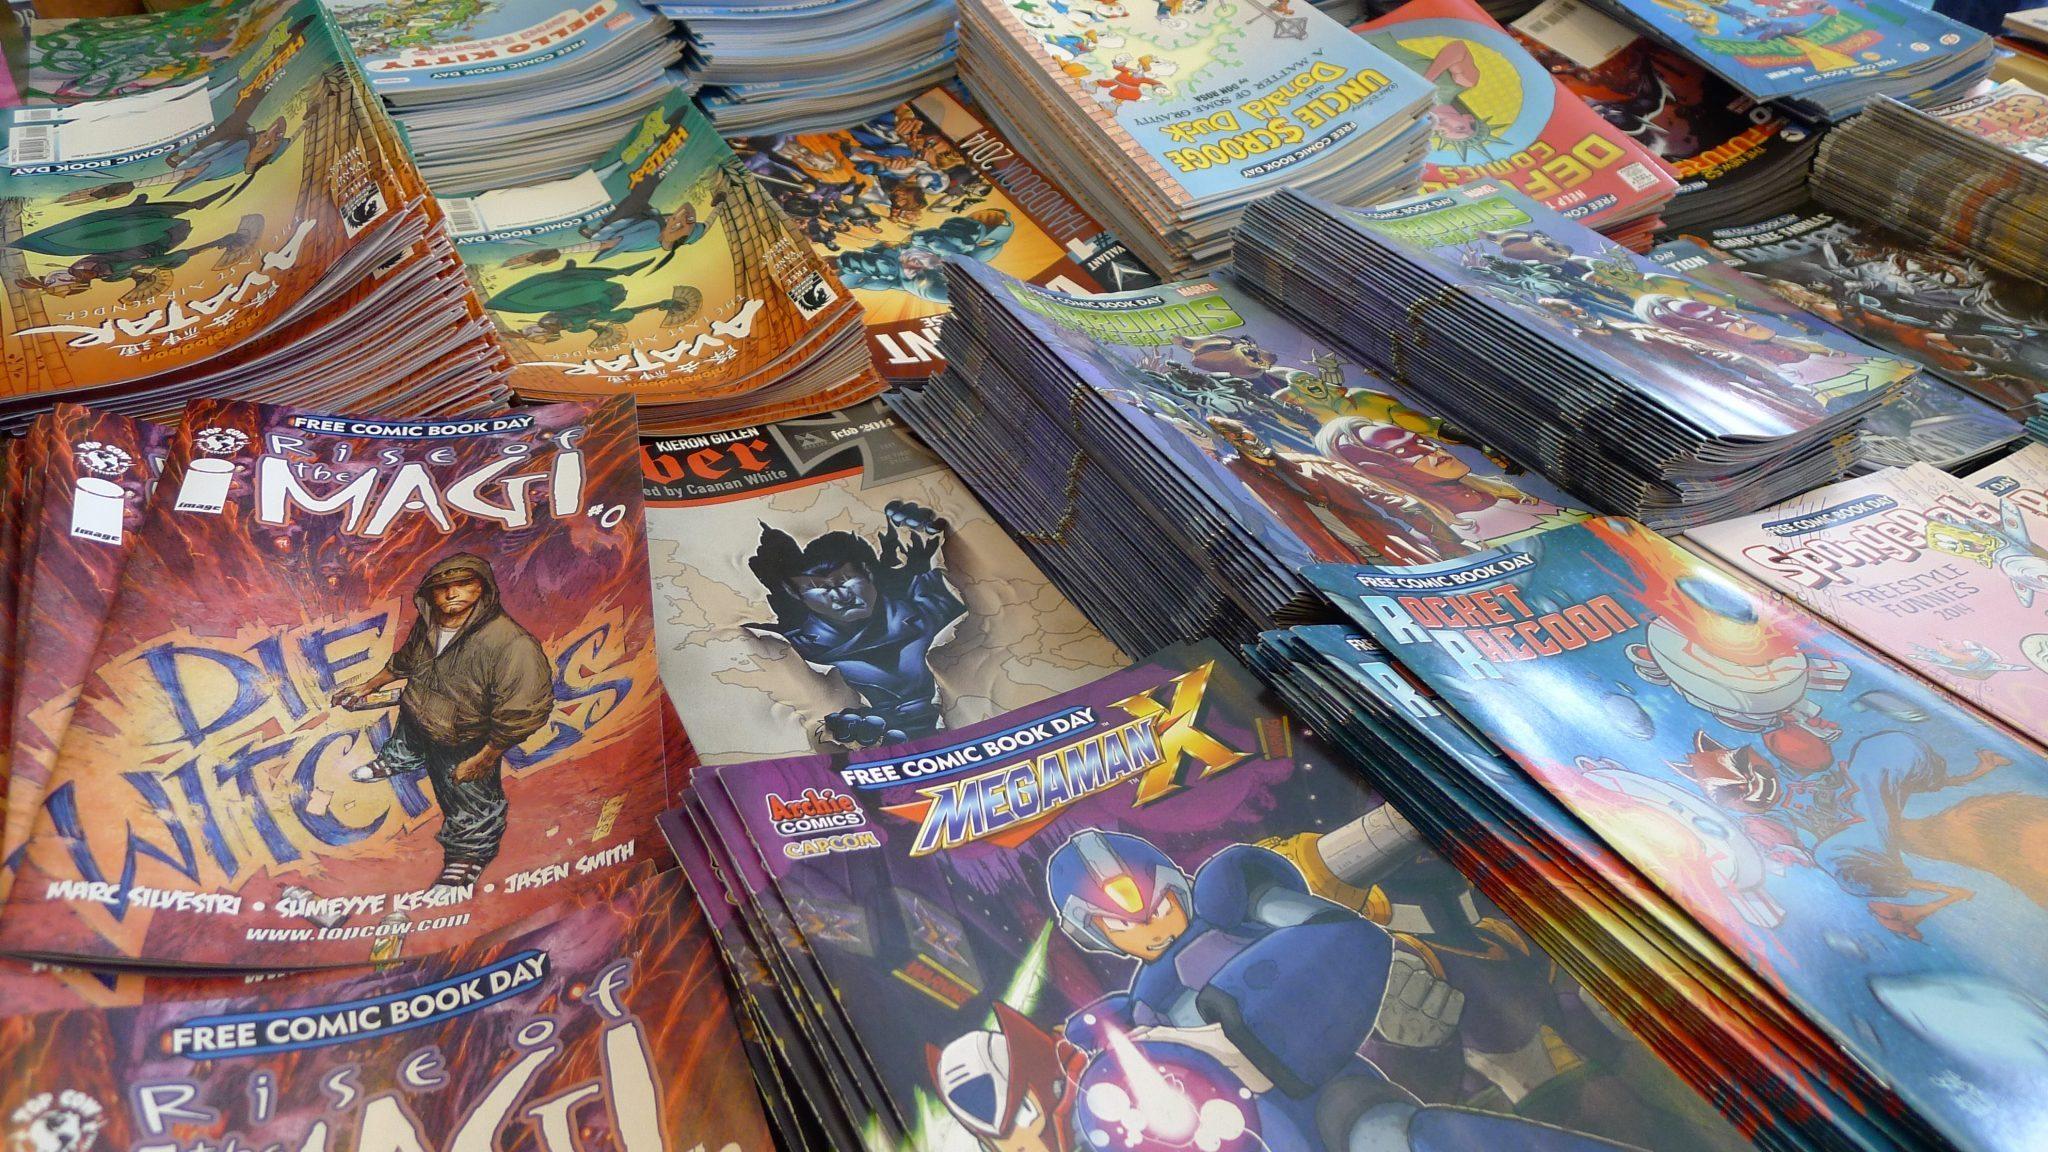 Nerdophiles Celebrates Free Comic Book Day 2014